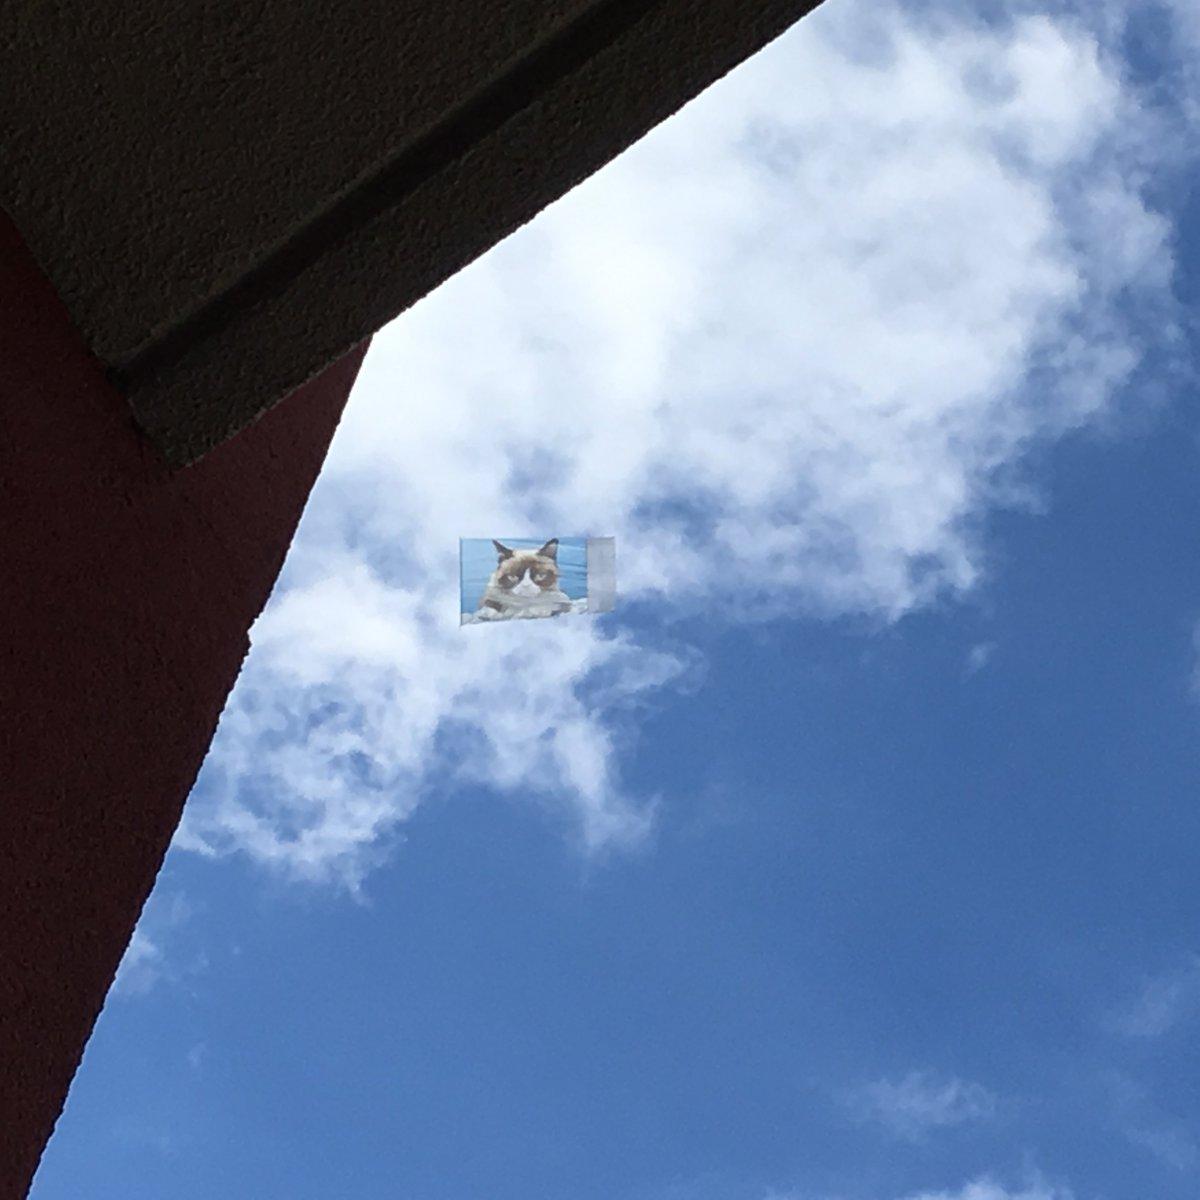 Look what is flying above #Austin right now for @sxsw !!  #grumpycat @RealGrumpyCat !!